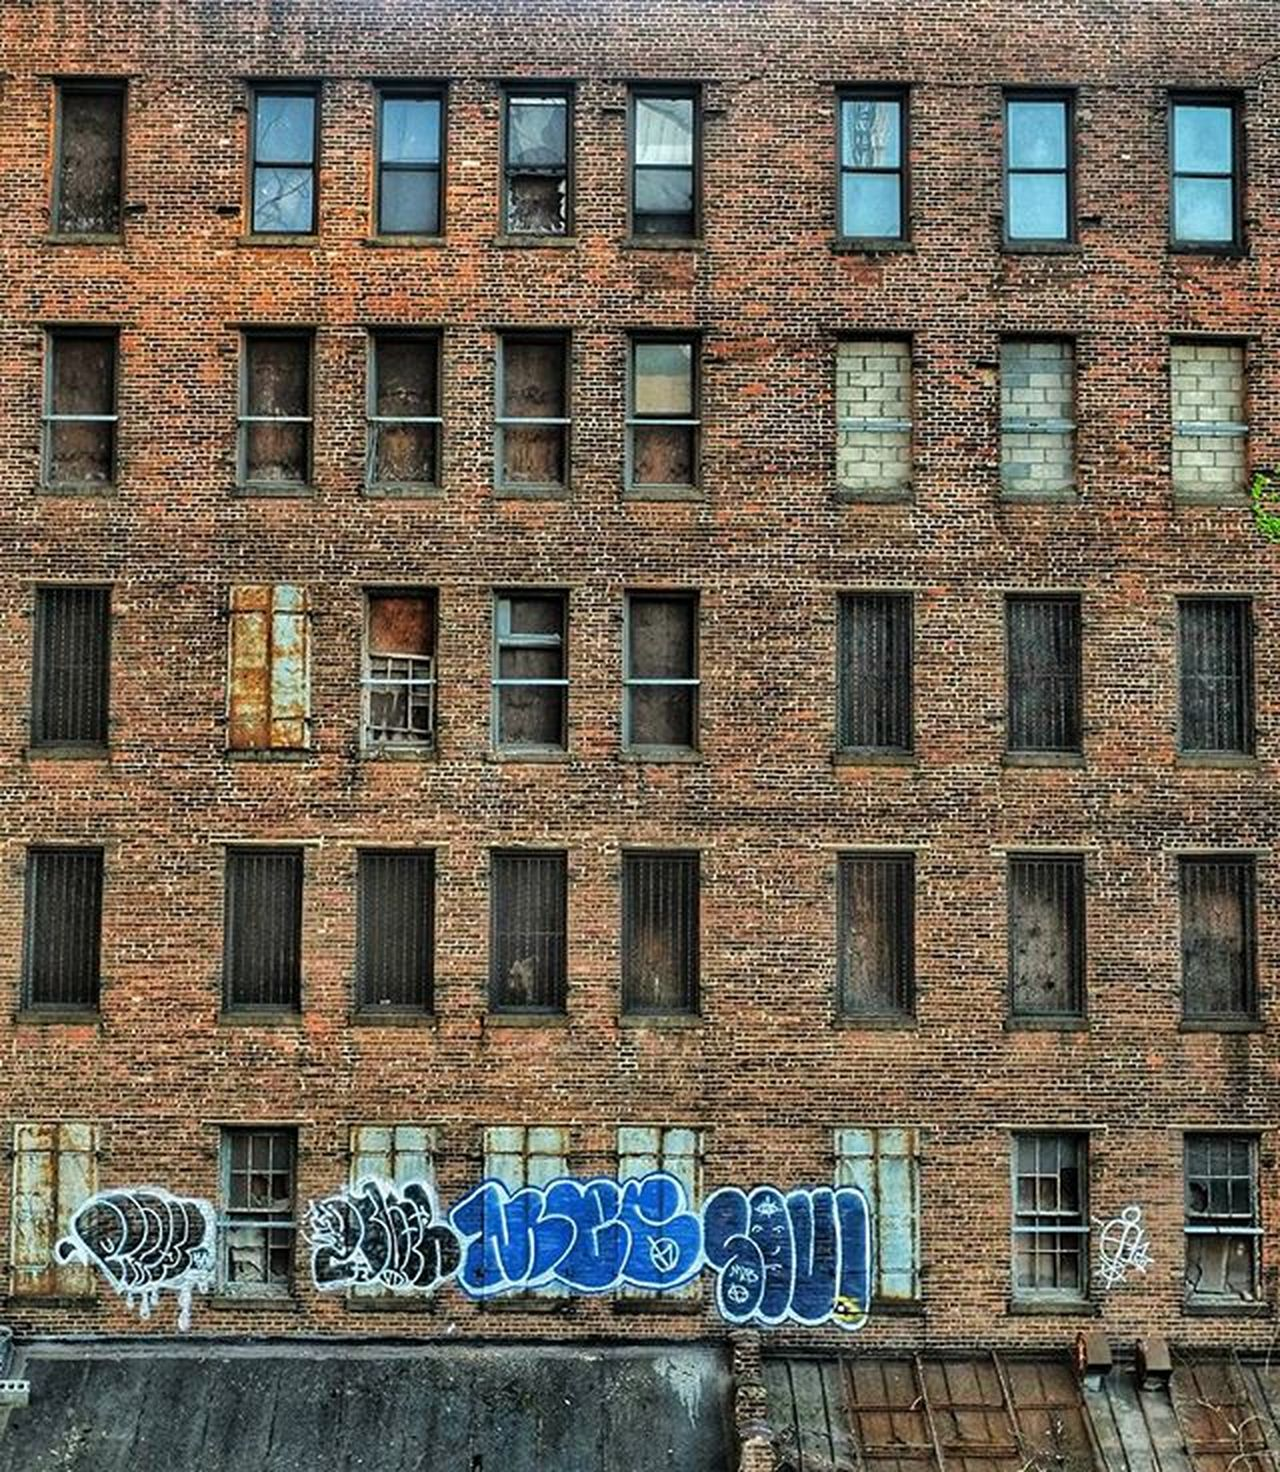 Dailywalk Window Newyork Leftbehind Emptyplaces Emptyspace Abandoned Brokenglass Newyorkcitystreet Nyinstagrammer NY Dailyphoto Graffiti Oldbuilding Beautyindecay